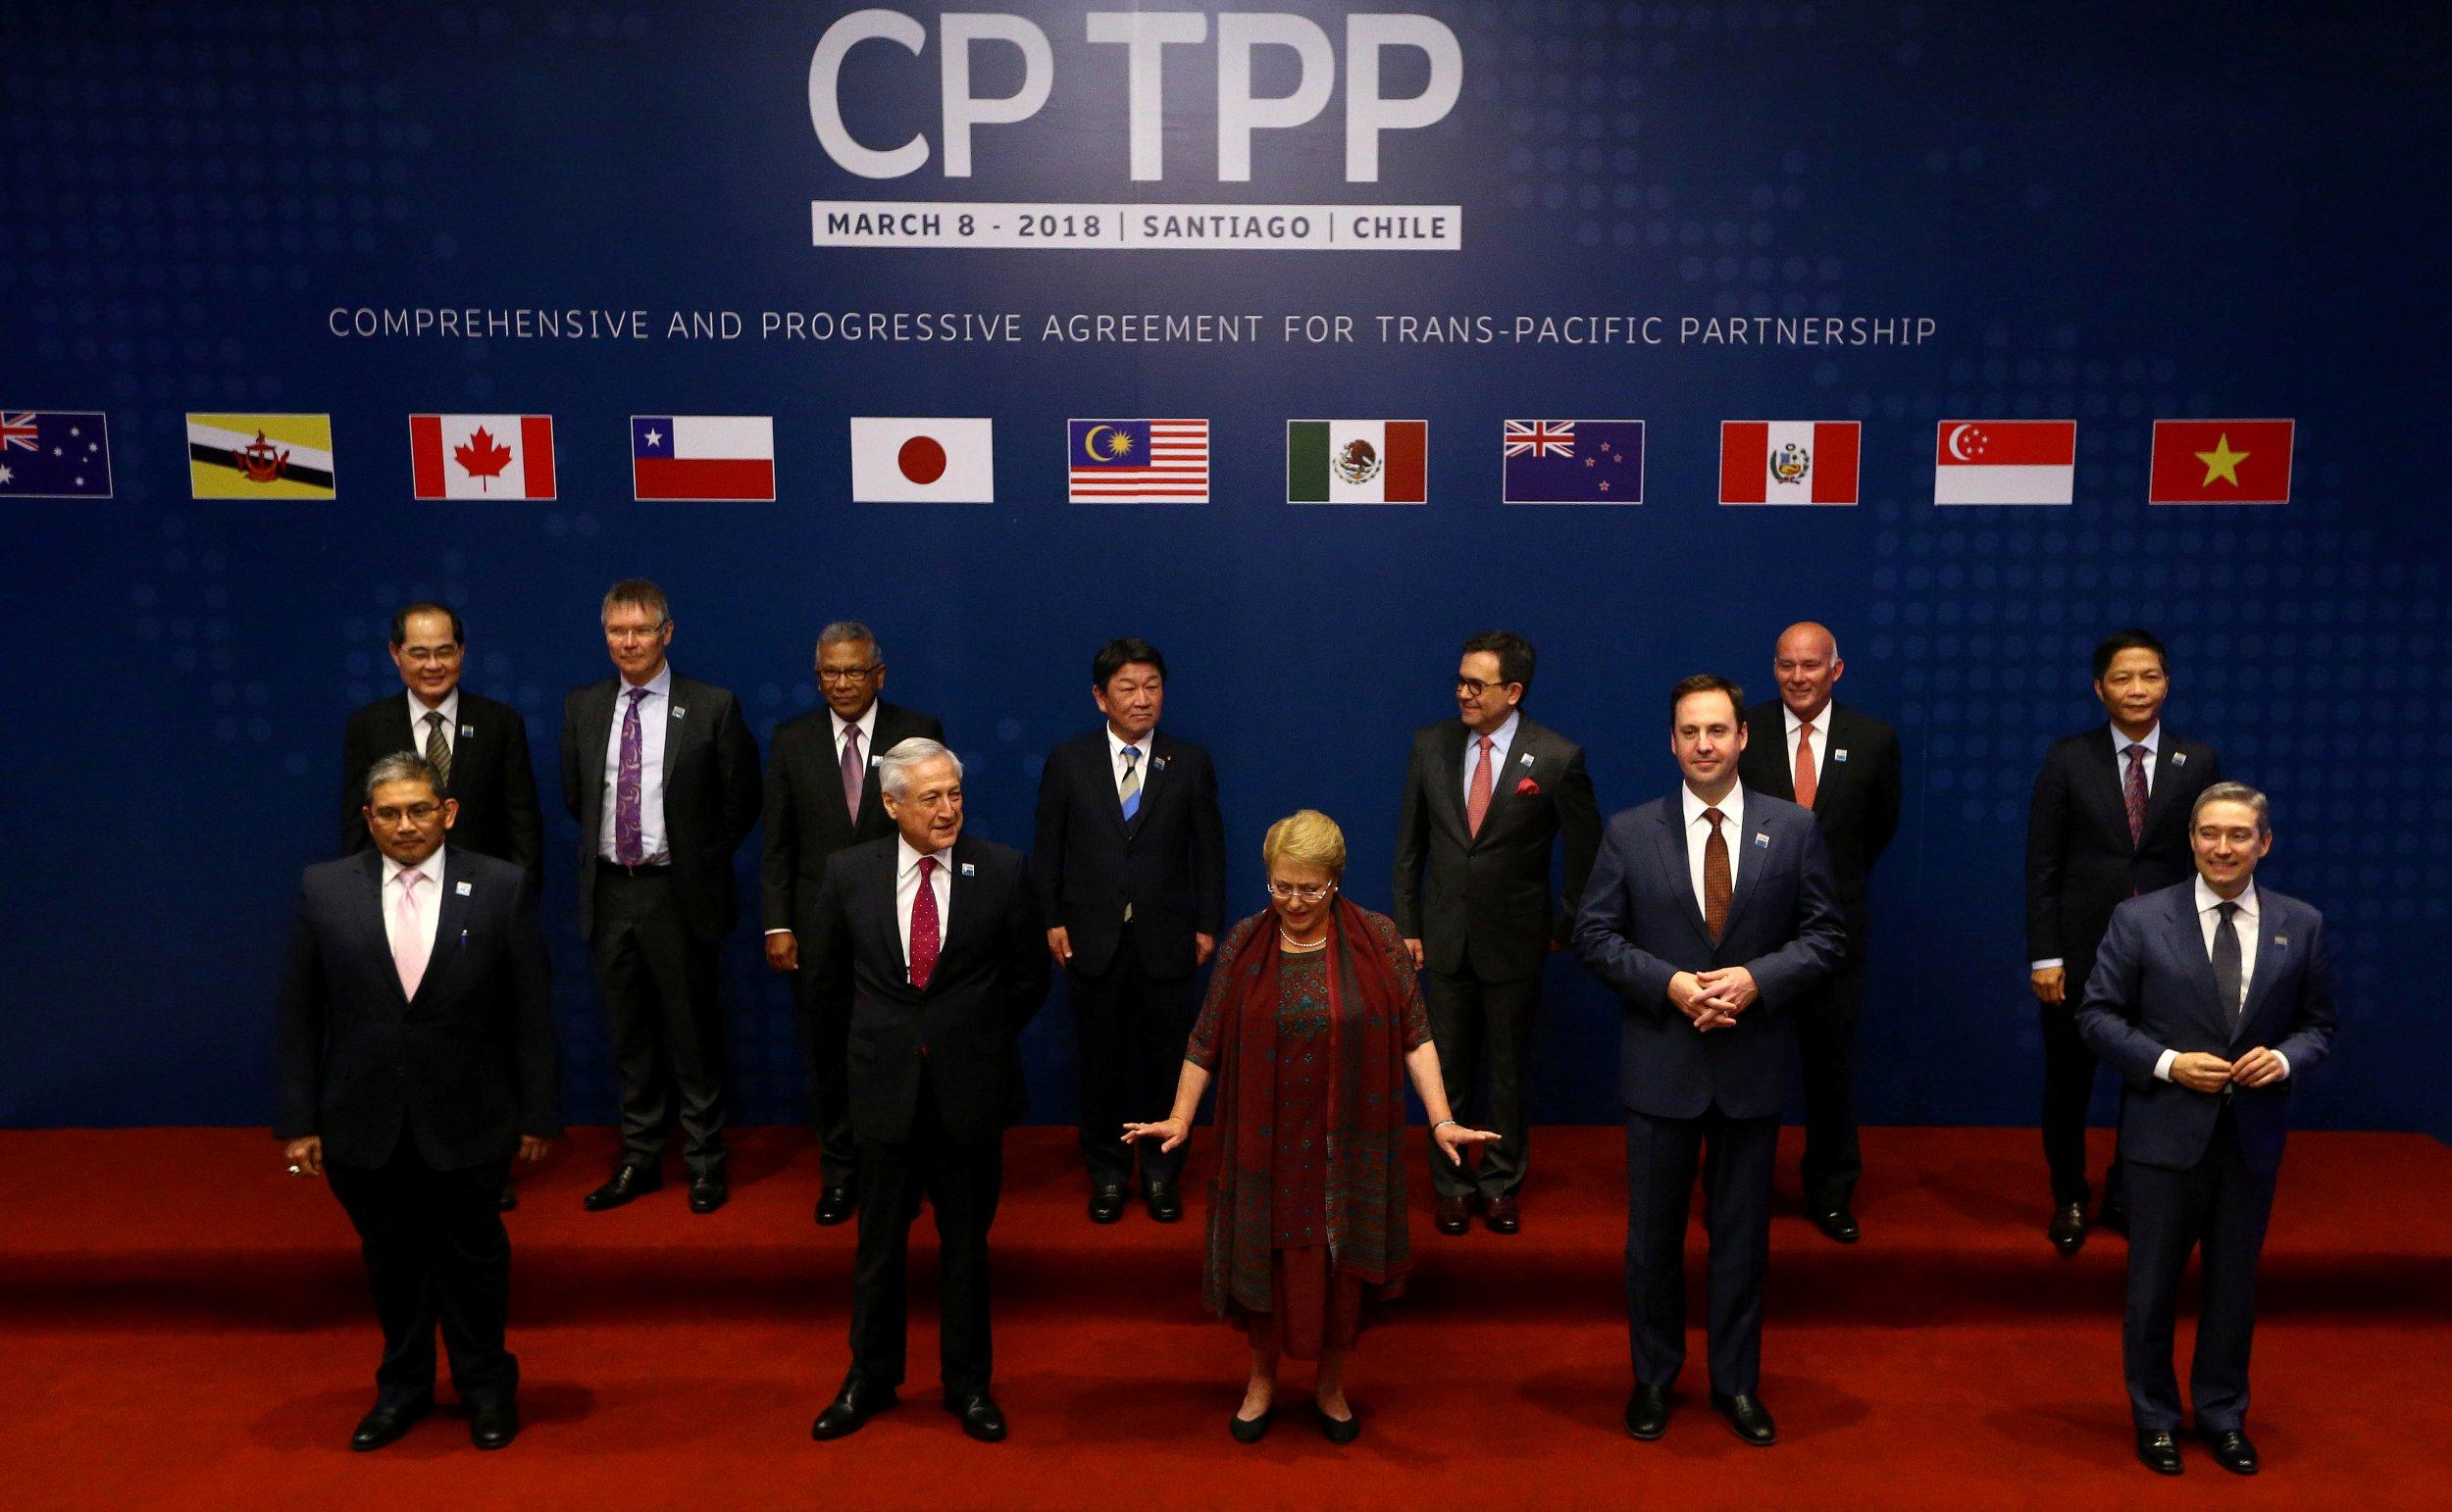 Trans-Pacific Partnership (TPP) Meeting